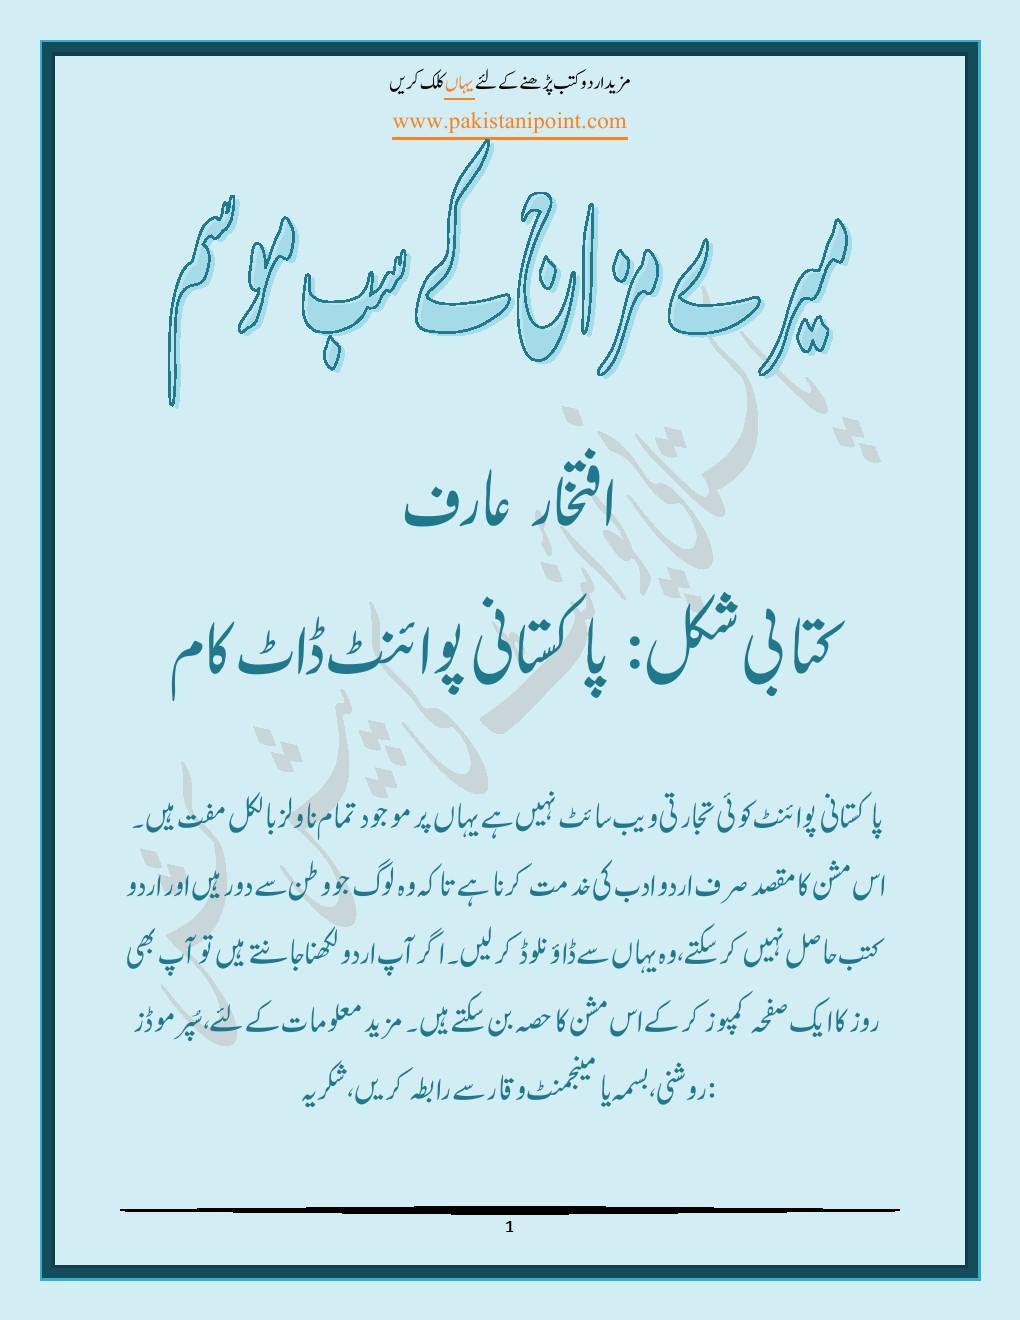 Mere Mizaj Kay Mausam by Iftikhar Arif